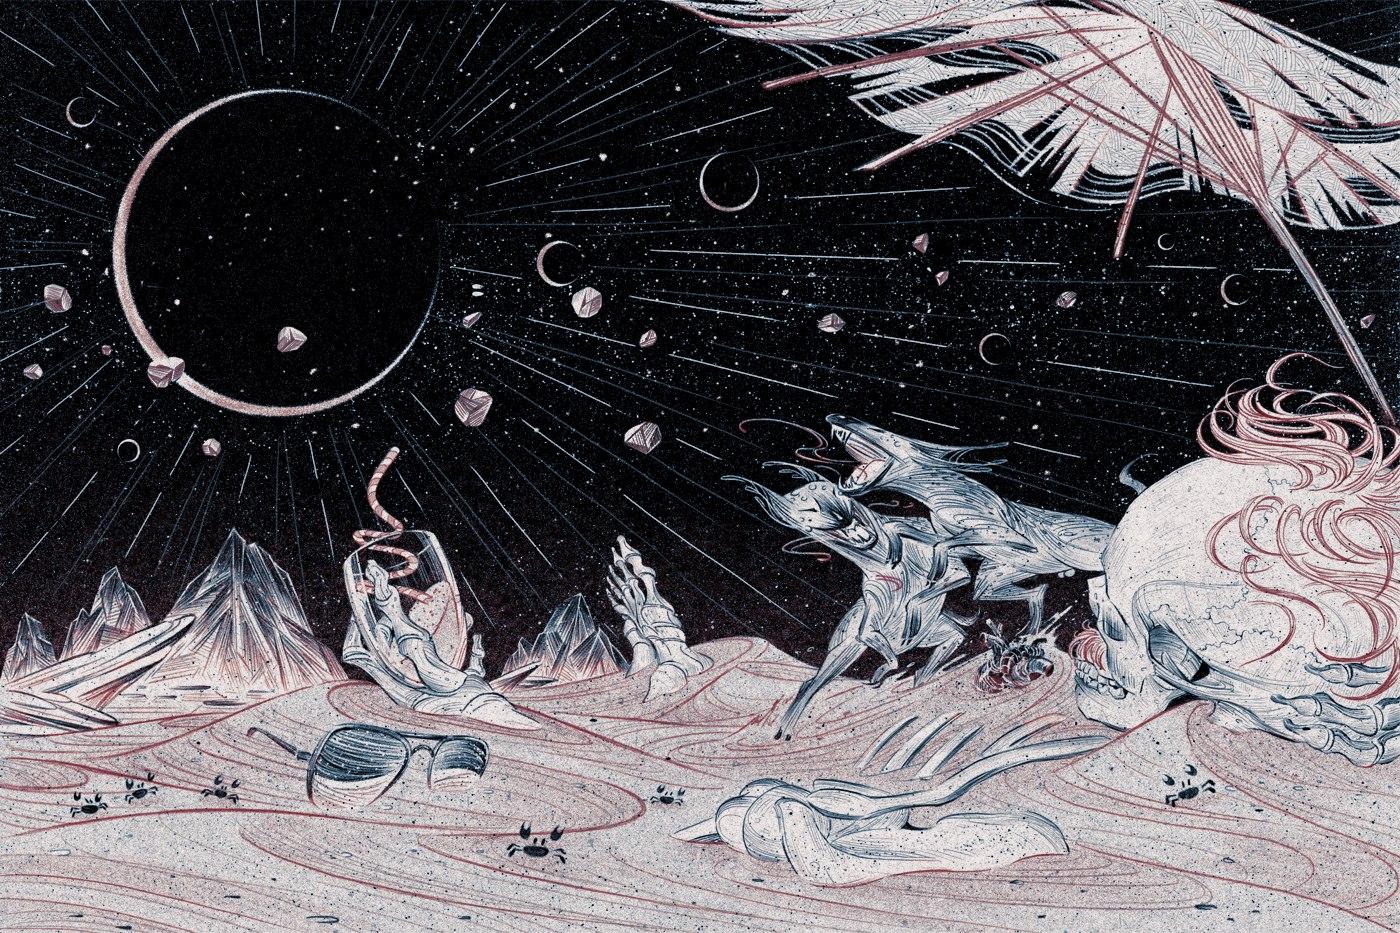 Звёздное небо и космос в картинках - Страница 5 H-0o0zscPeA